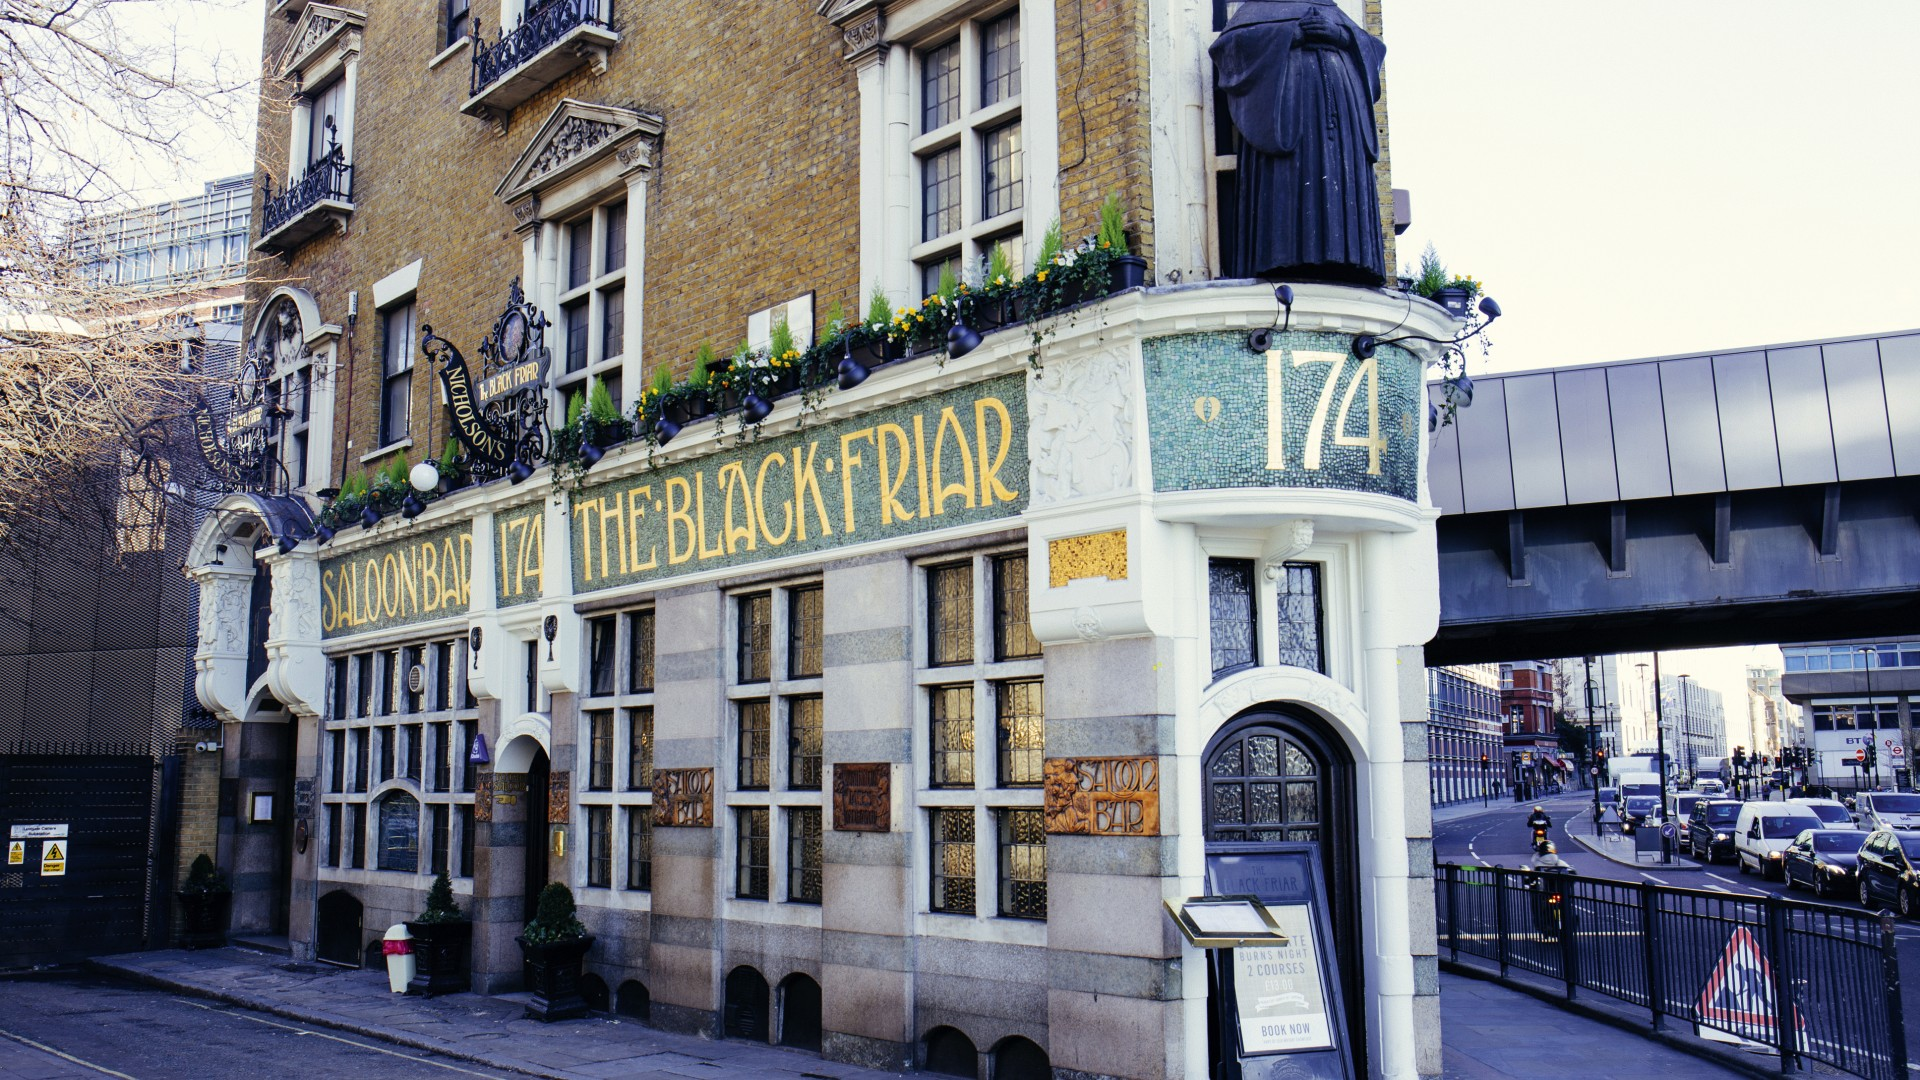 The Blackfriar pub, Square Mile Pub Awards 2017 Winner